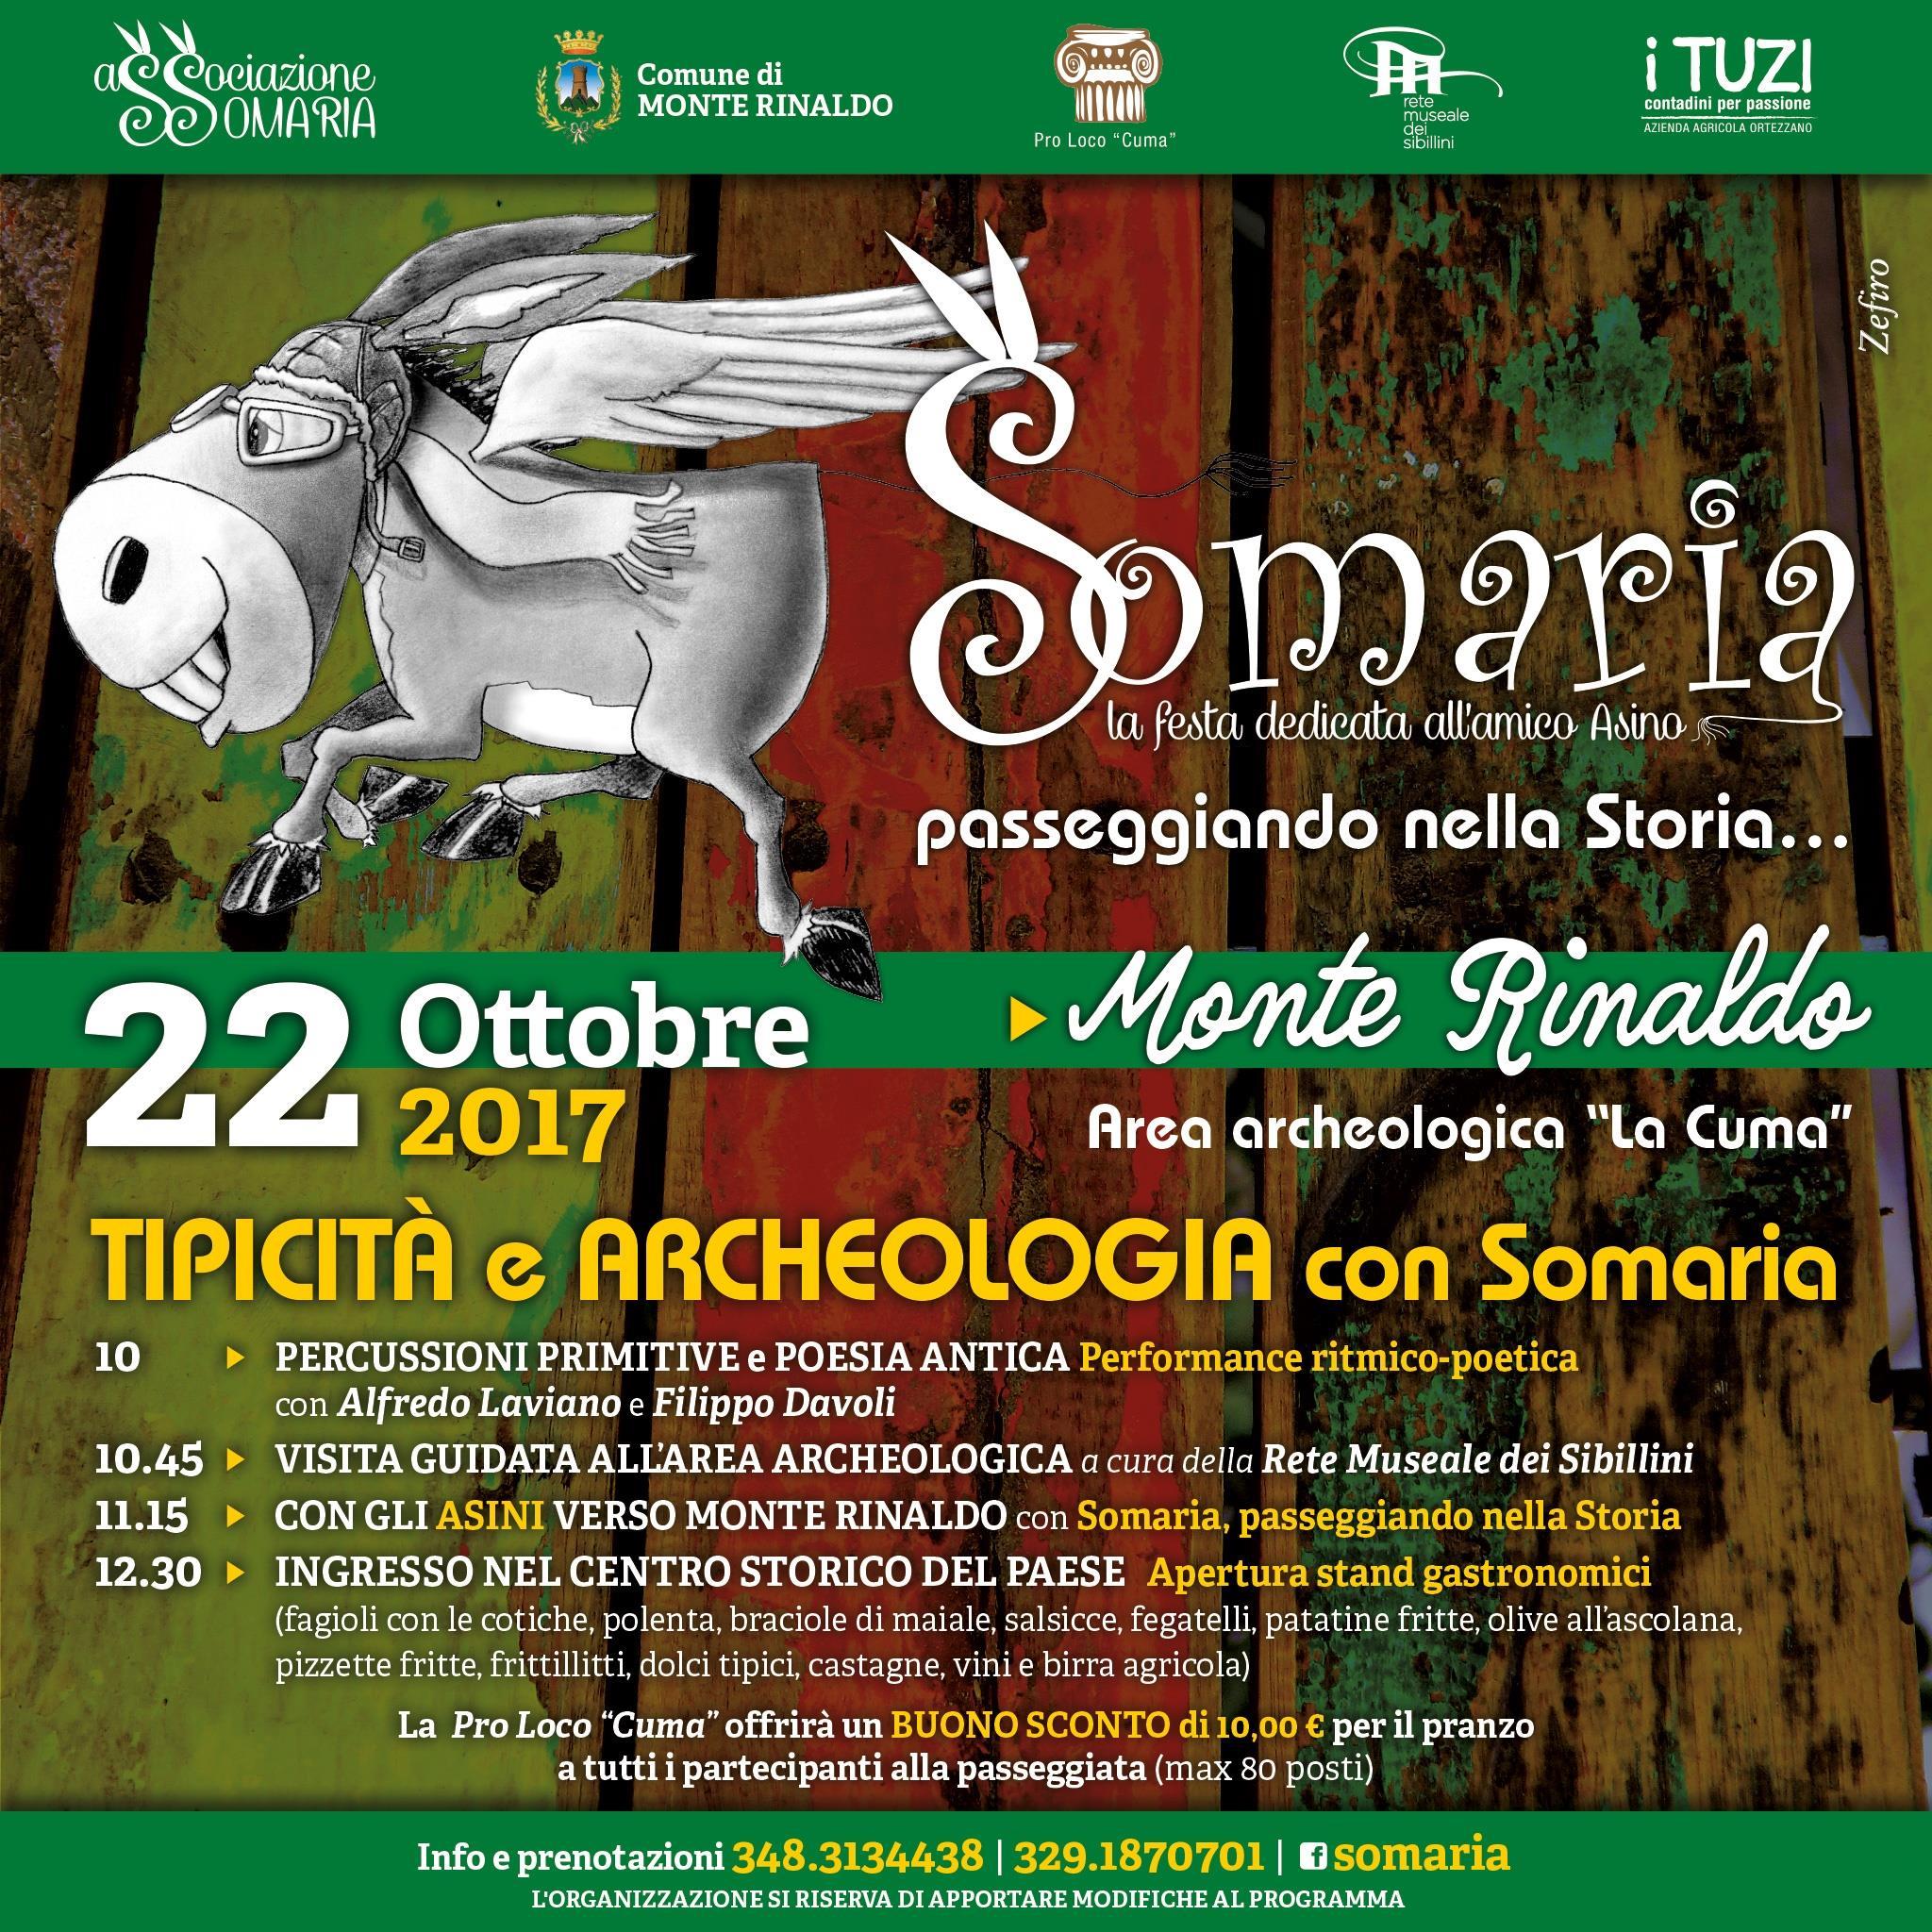 Tipicità & Archeologia con Somaria